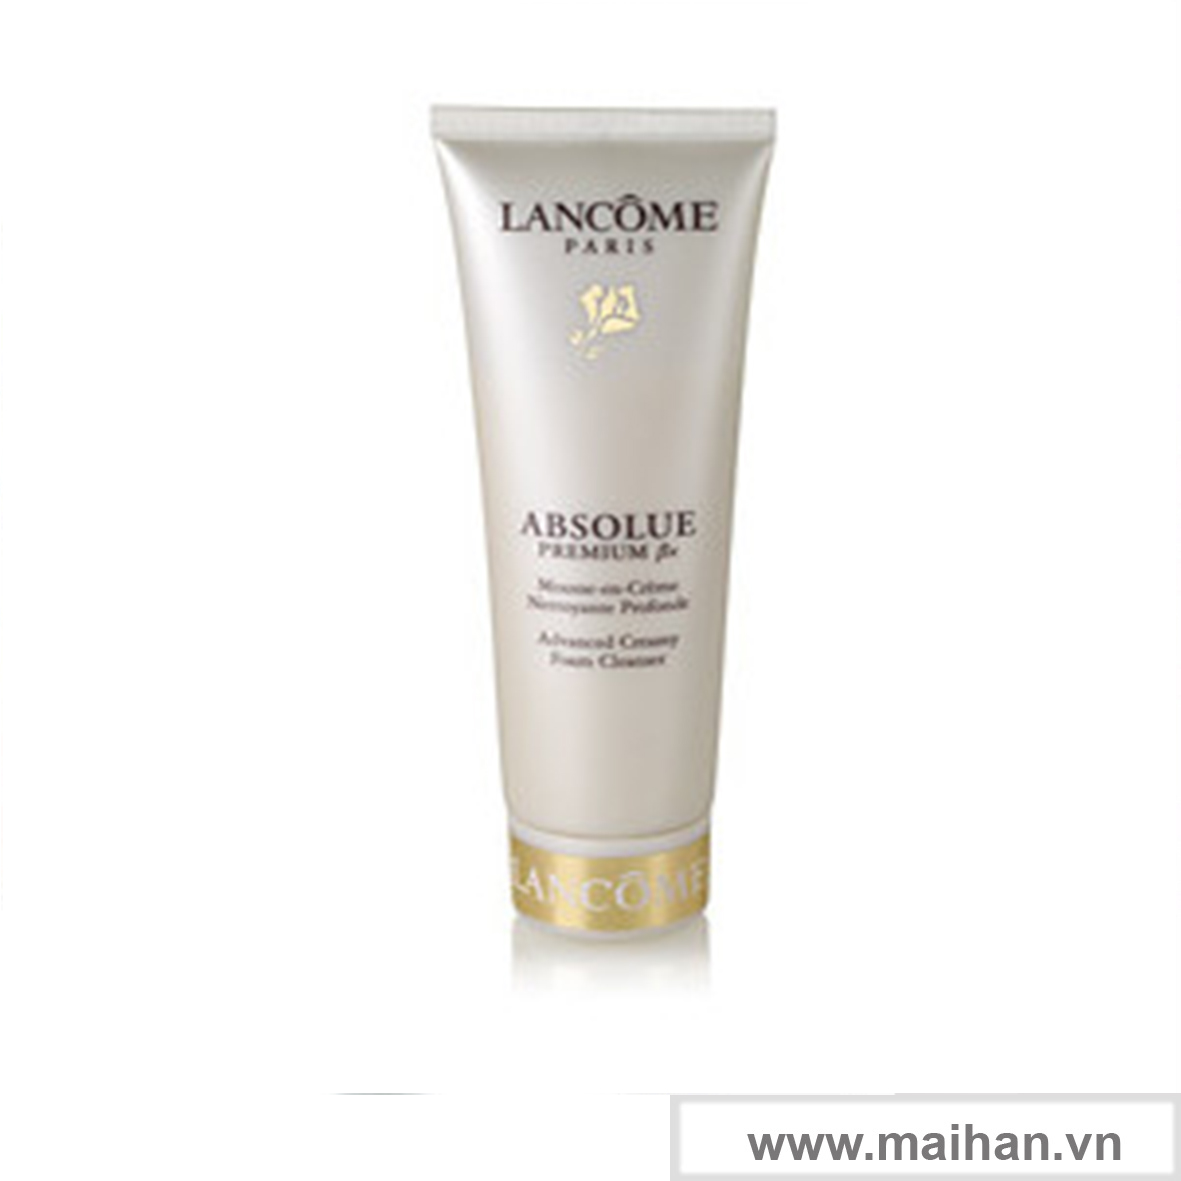 Sữa rửa mặt Lancôme